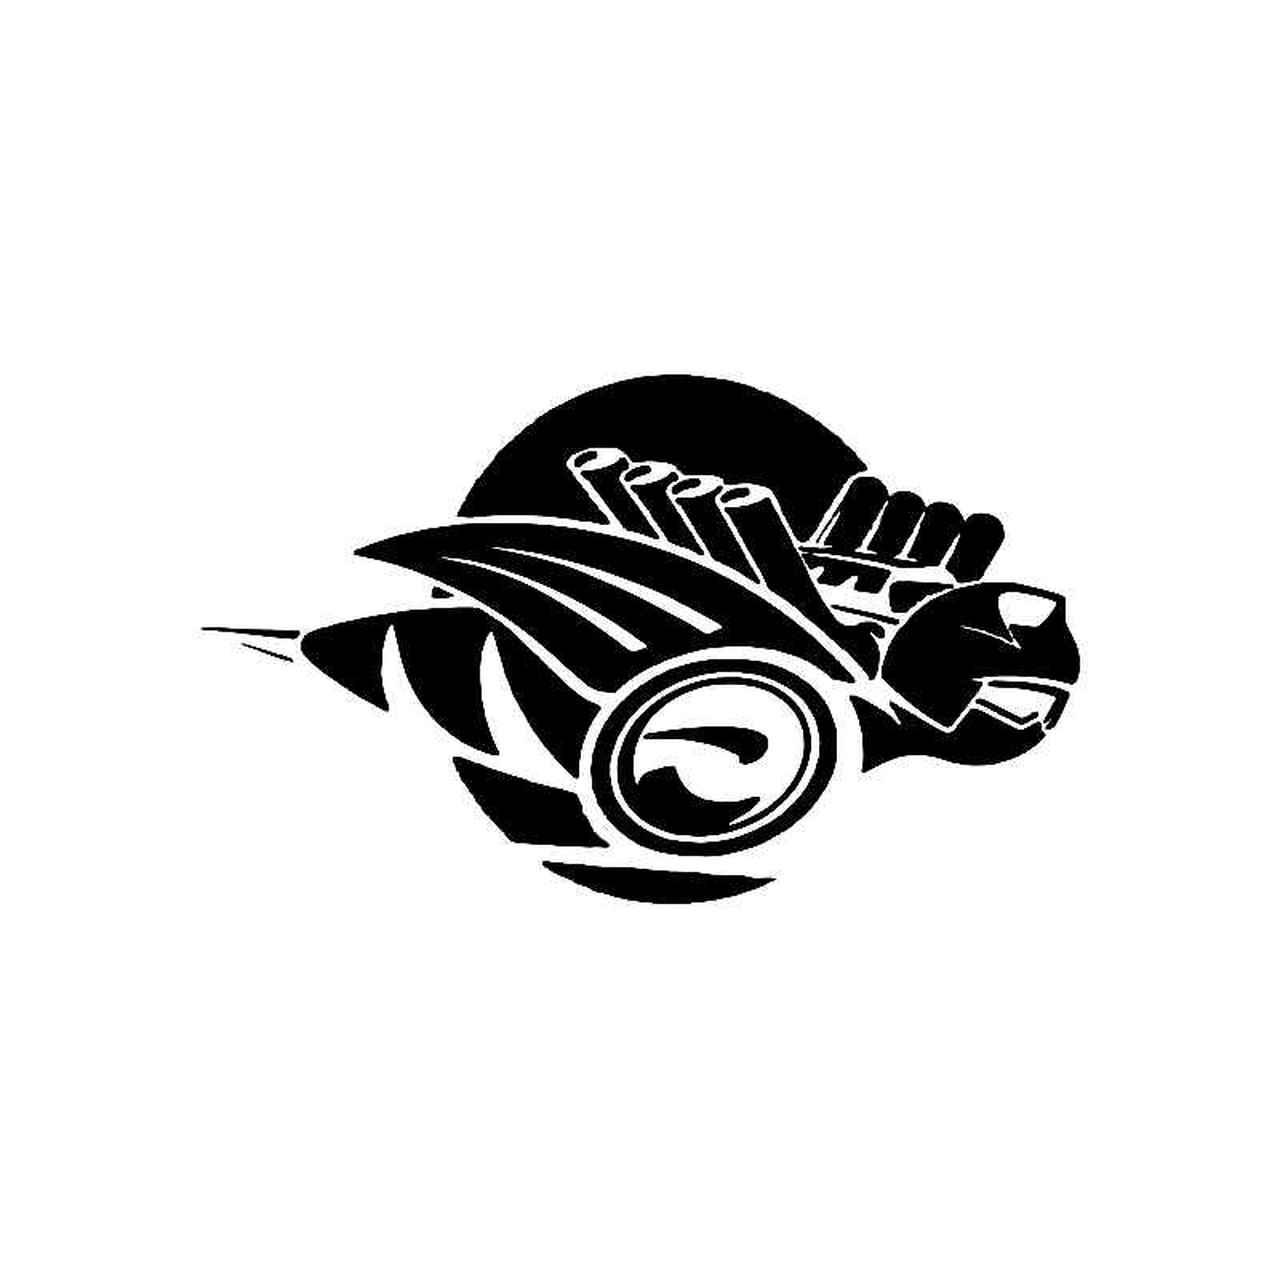 Dodge Rumble Bee Logo Jdm Decal.